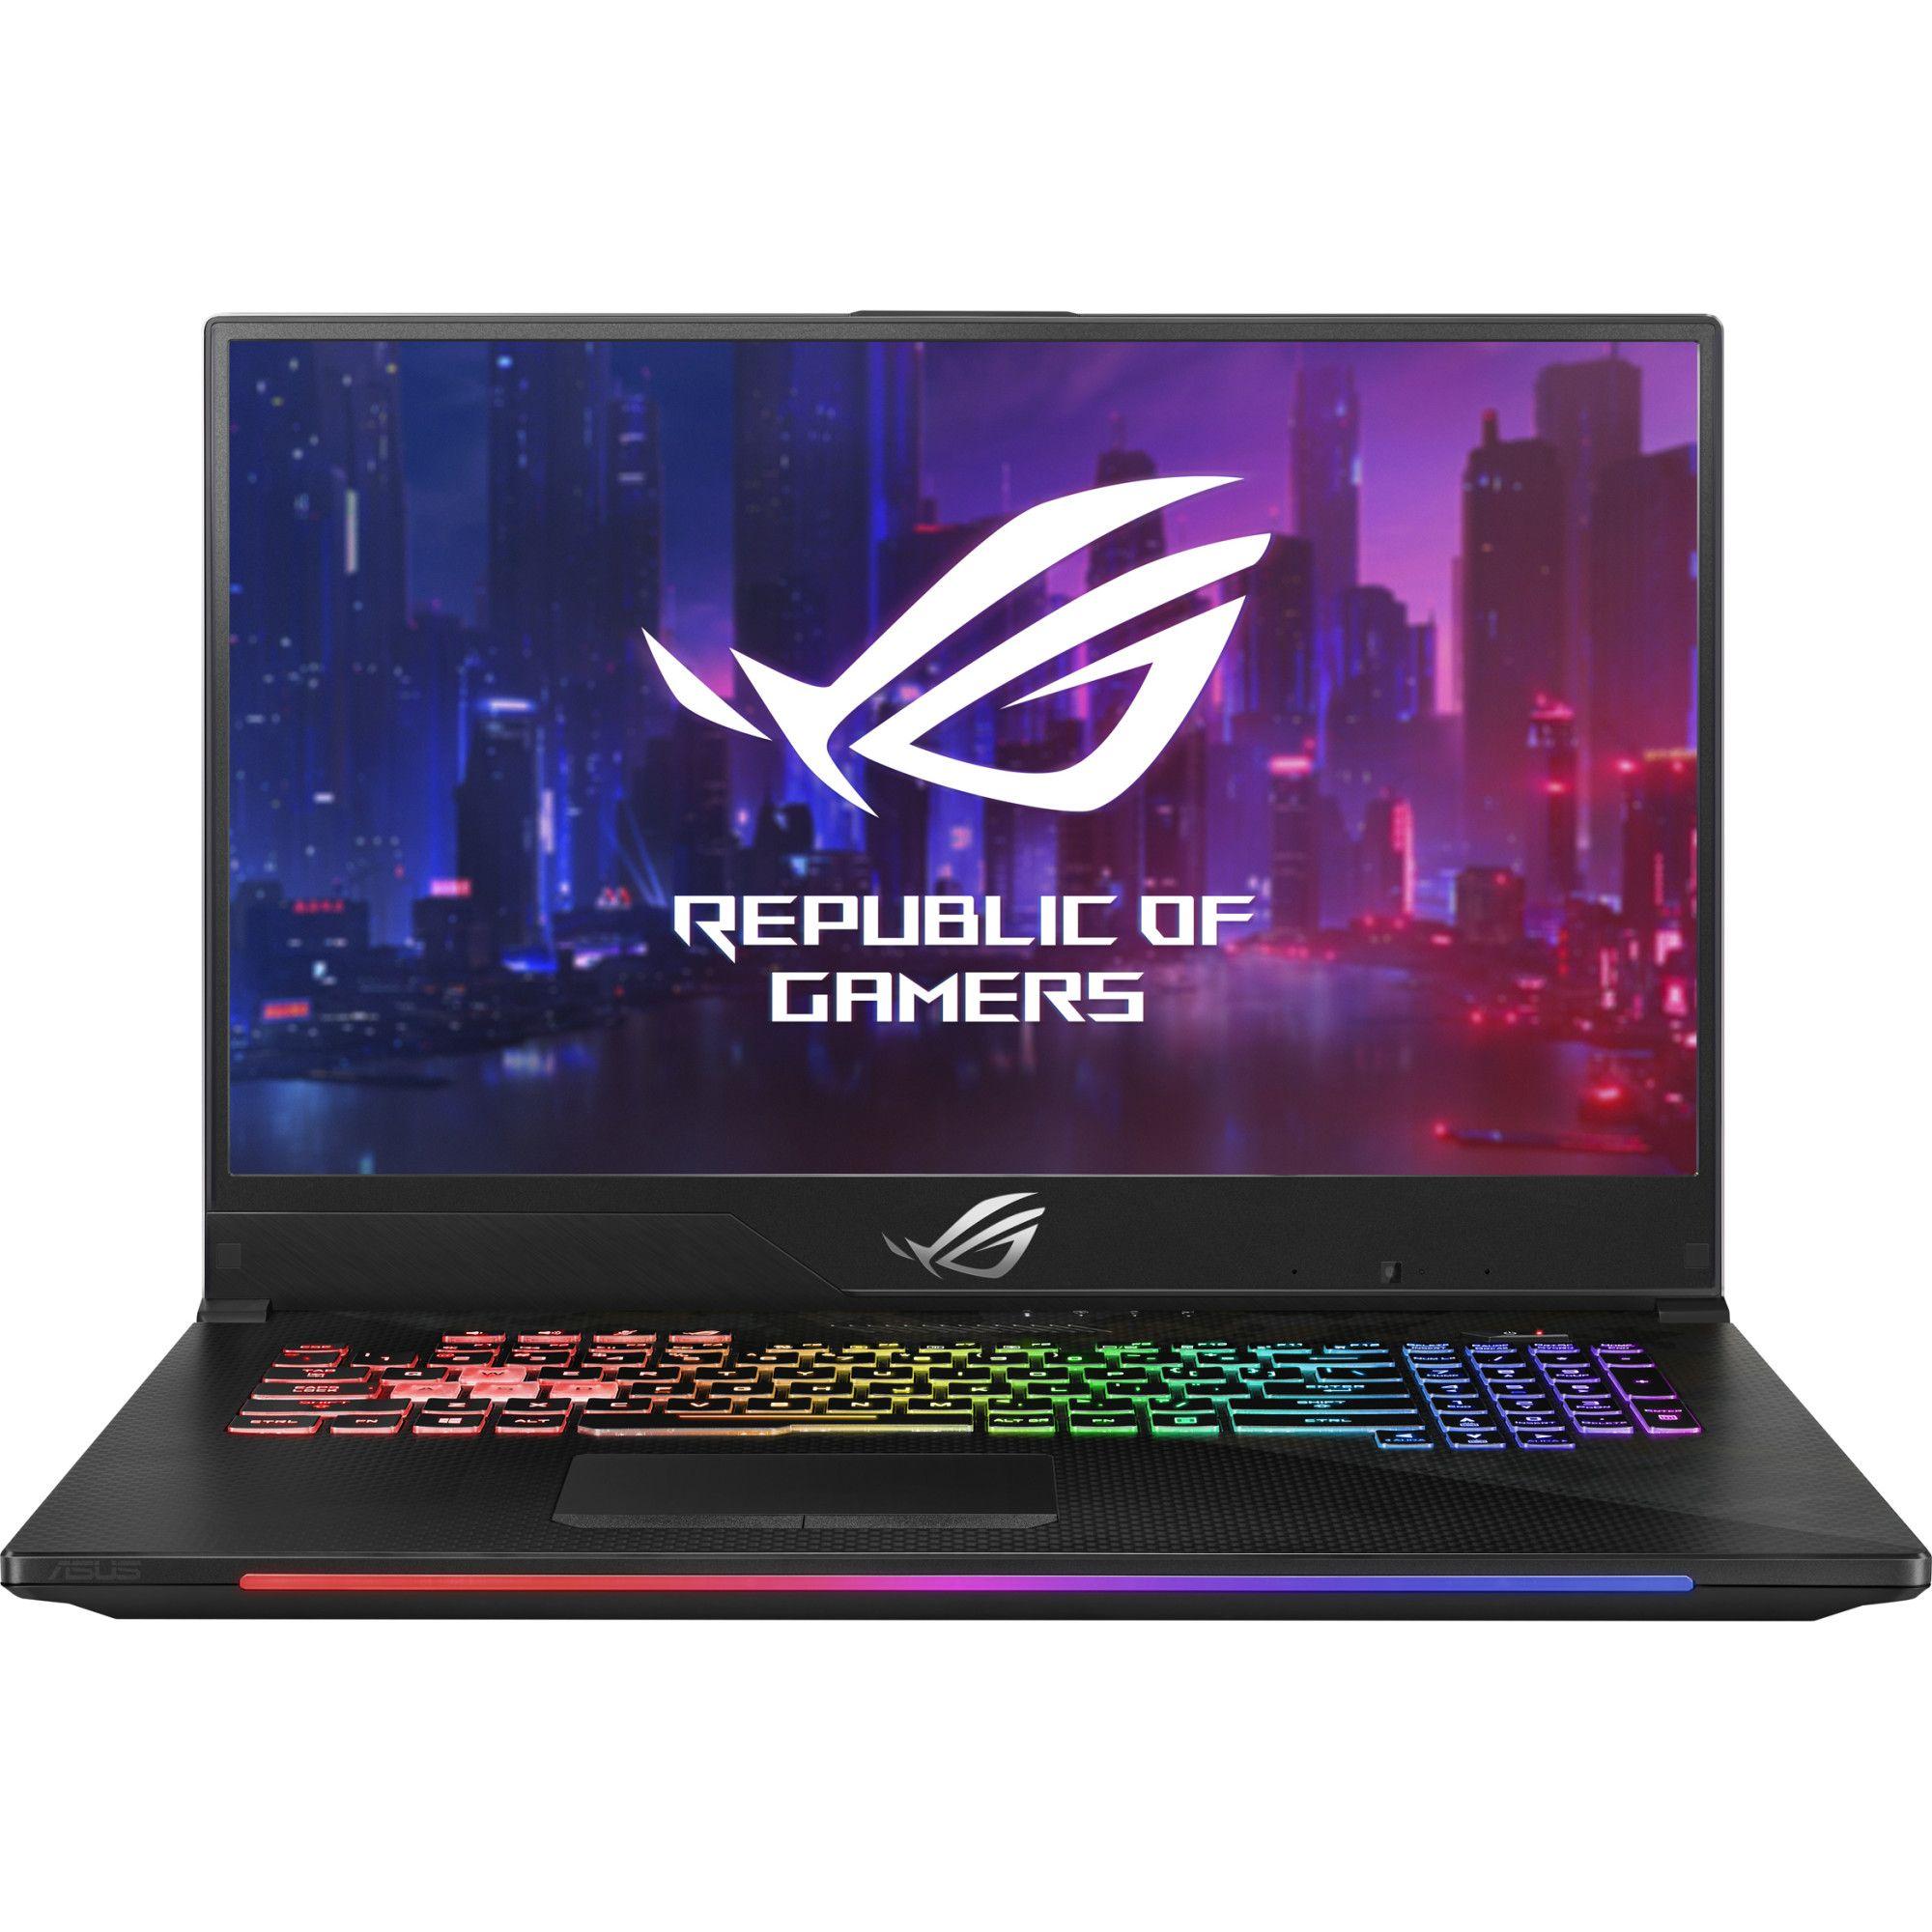 Notebook Asus ROG STRIX GL704GM 17.3 Full HD Intel Core i7-8750H GTX 1060-6GB RAM 8GB HDD 1TB No OS Negru